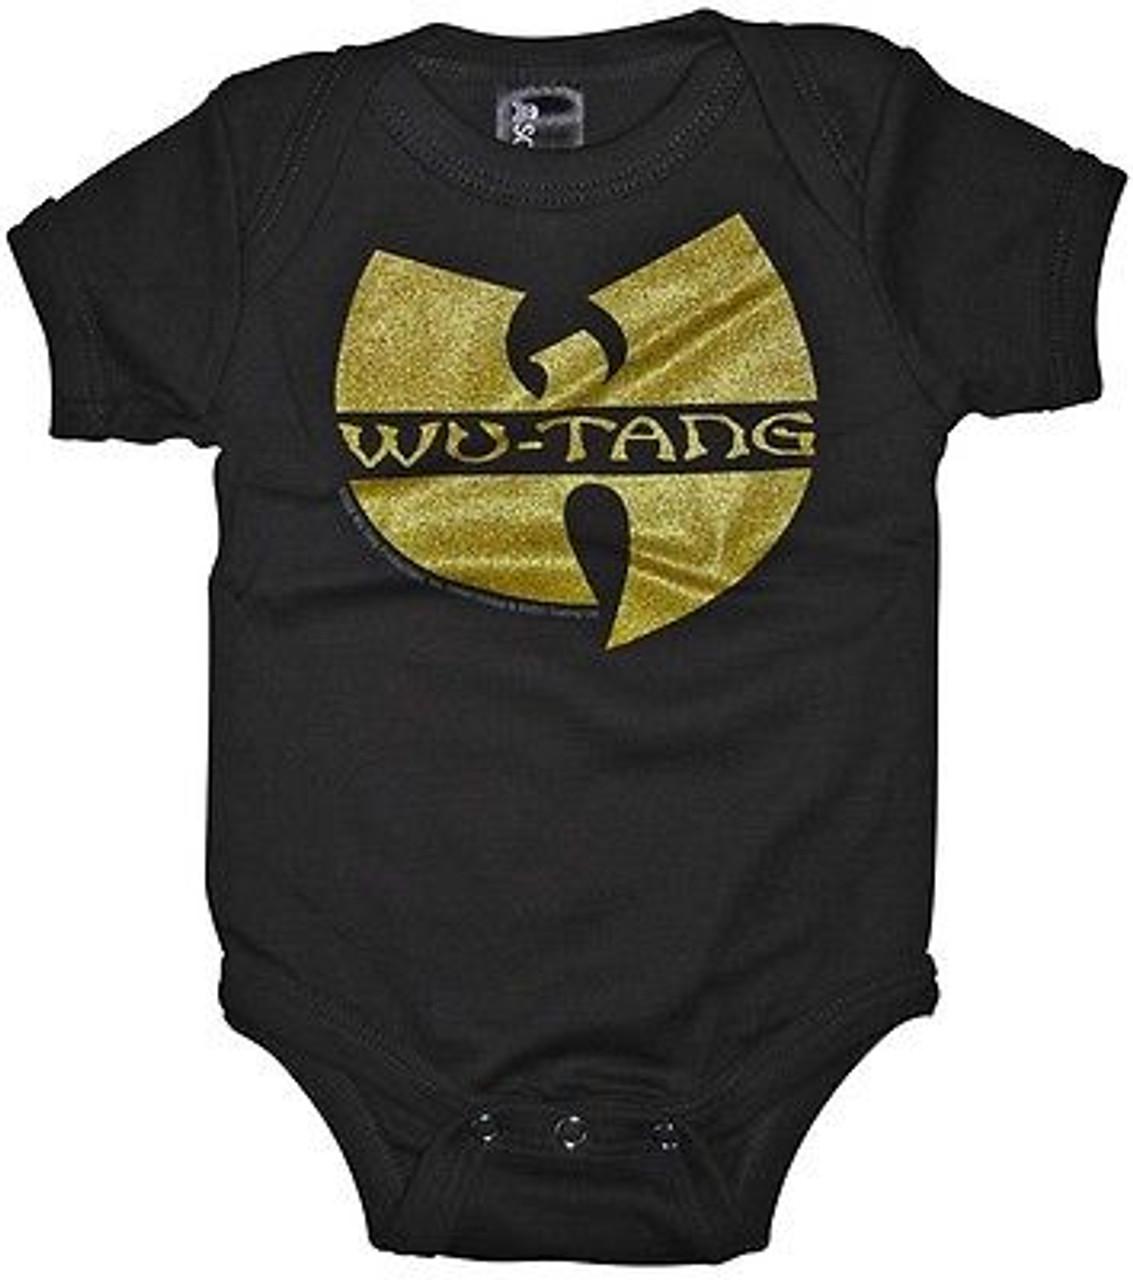 SOURPUSS WU-TANG LOGO RAP HIP HOP MUSIC BABY INFANT KIDS ROMPER ONE PIECE PUNK